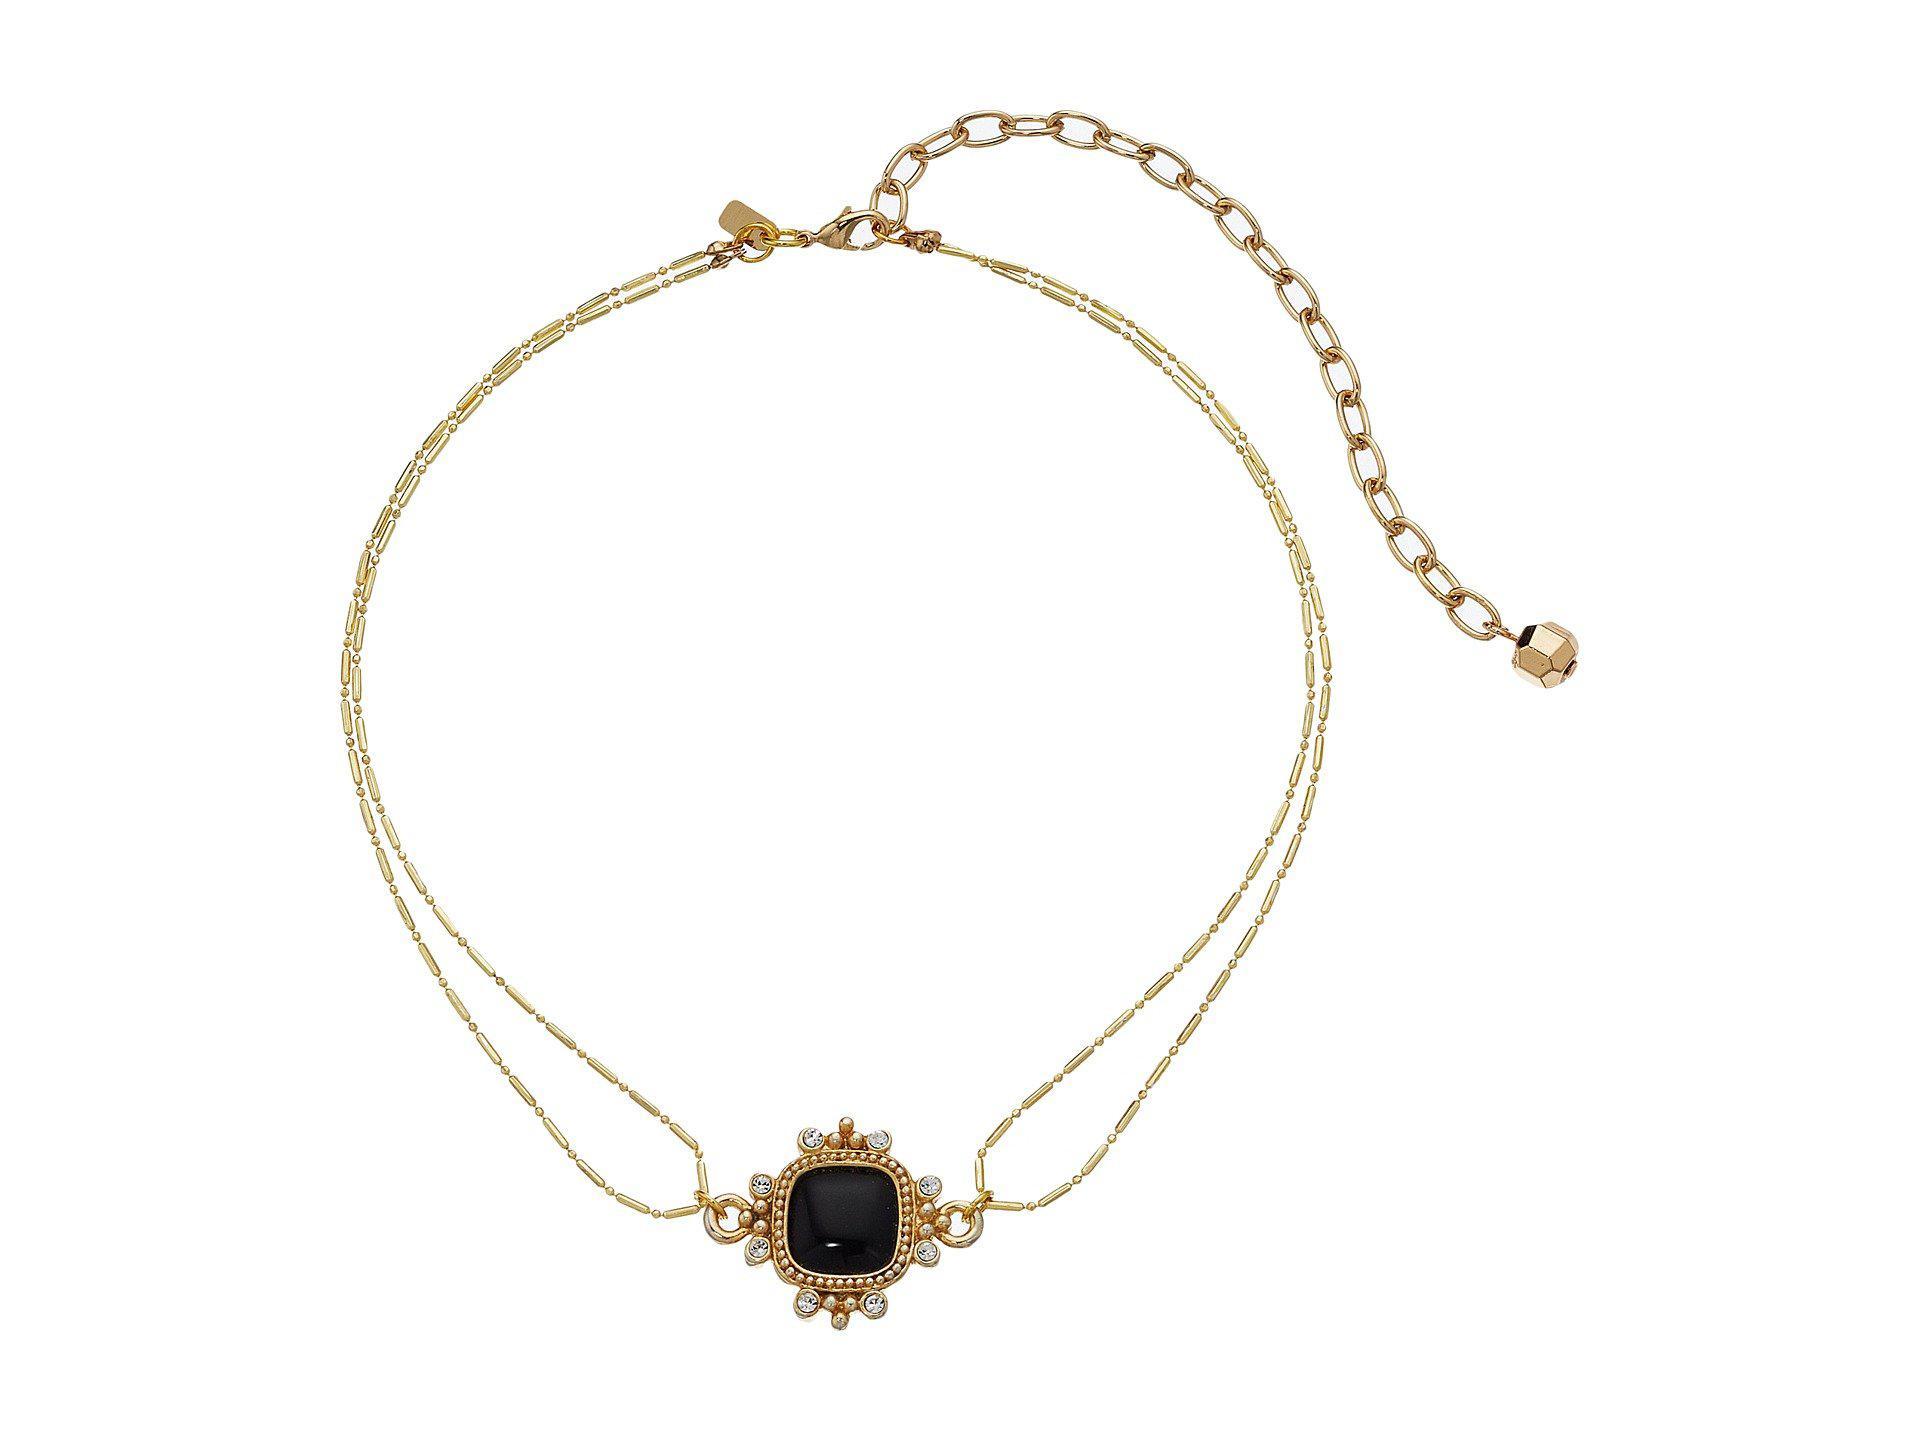 178d9b6b49b Vanessa Mooney The Saint Andrea Choker Necklace in Metallic - Lyst